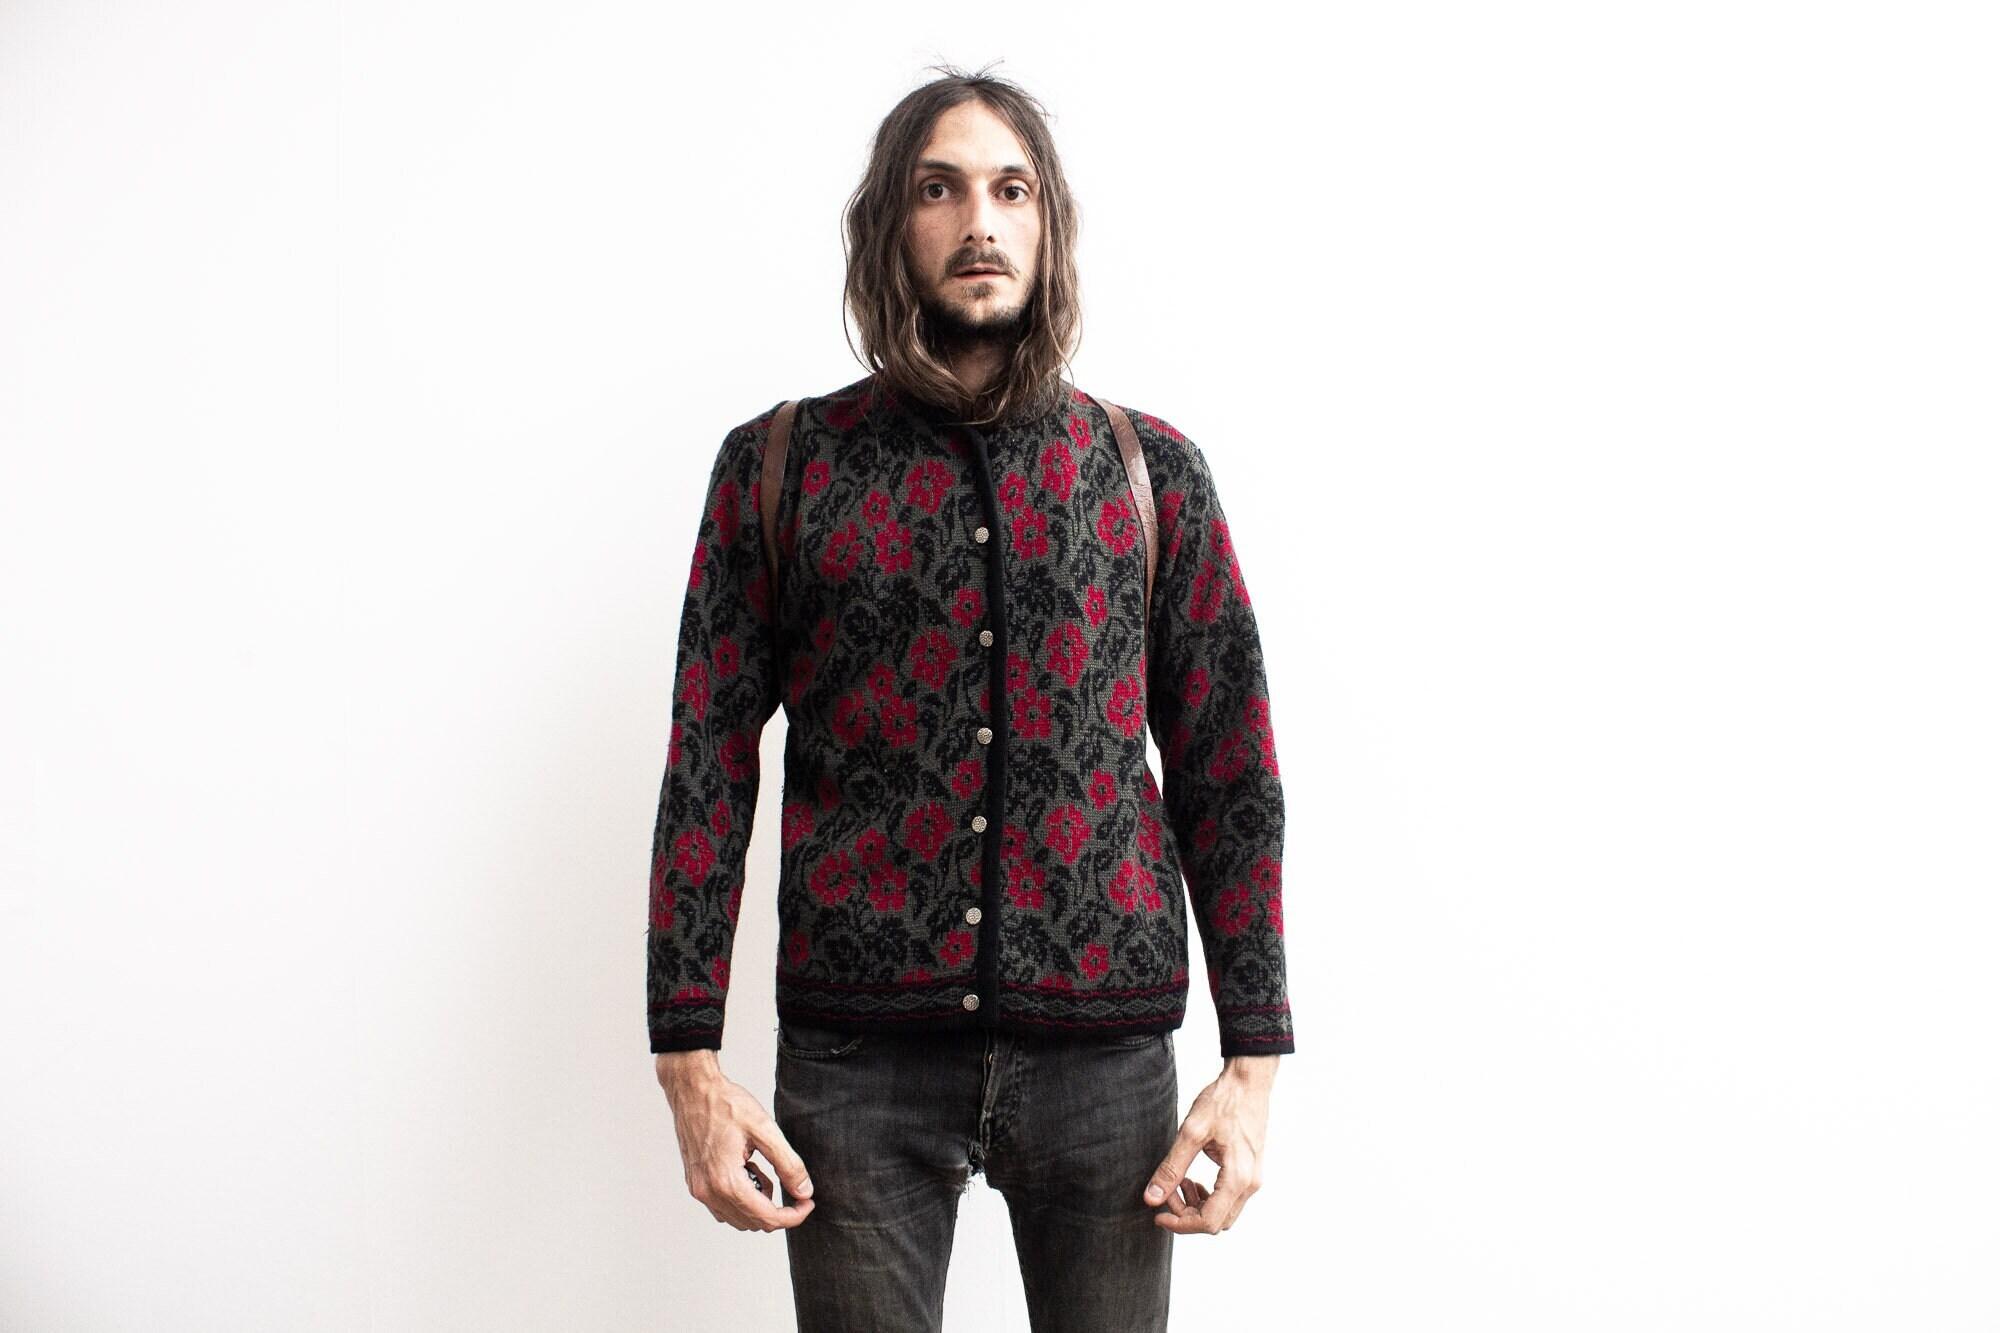 80s Sweatshirts, Sweaters, Vests | Women Floral Pattern Cardigan . 80S Retro Flower Knit Sweater Winter Vest. Botanical $54.23 AT vintagedancer.com